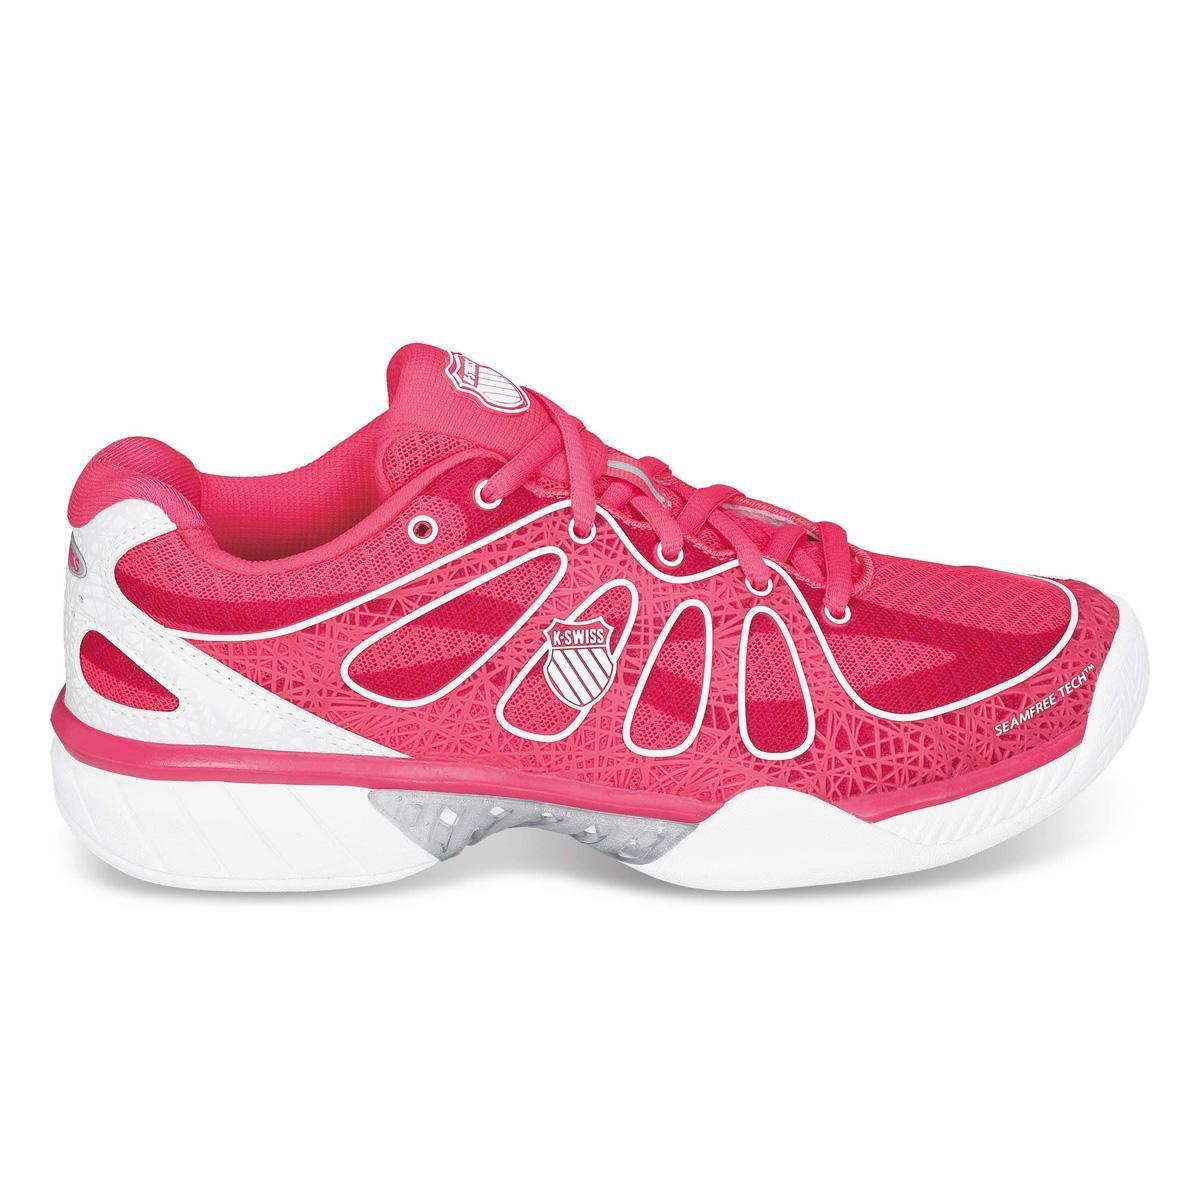 Ks Tfw Ultra-Express-neon Red/White, Womens Tennis K-Swiss